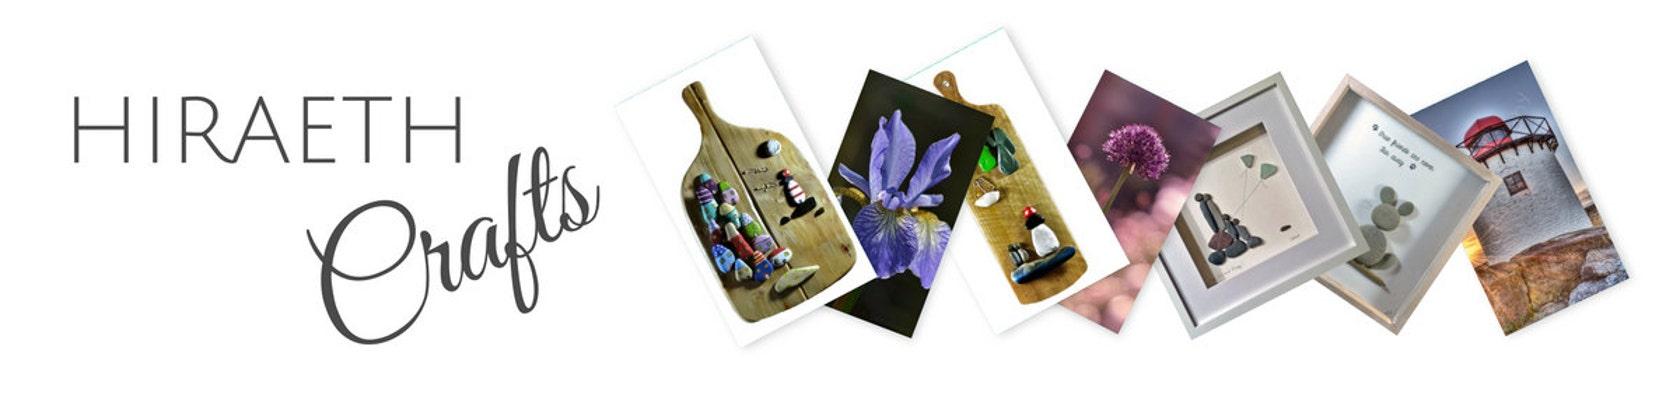 Craft Shop Carmarthen